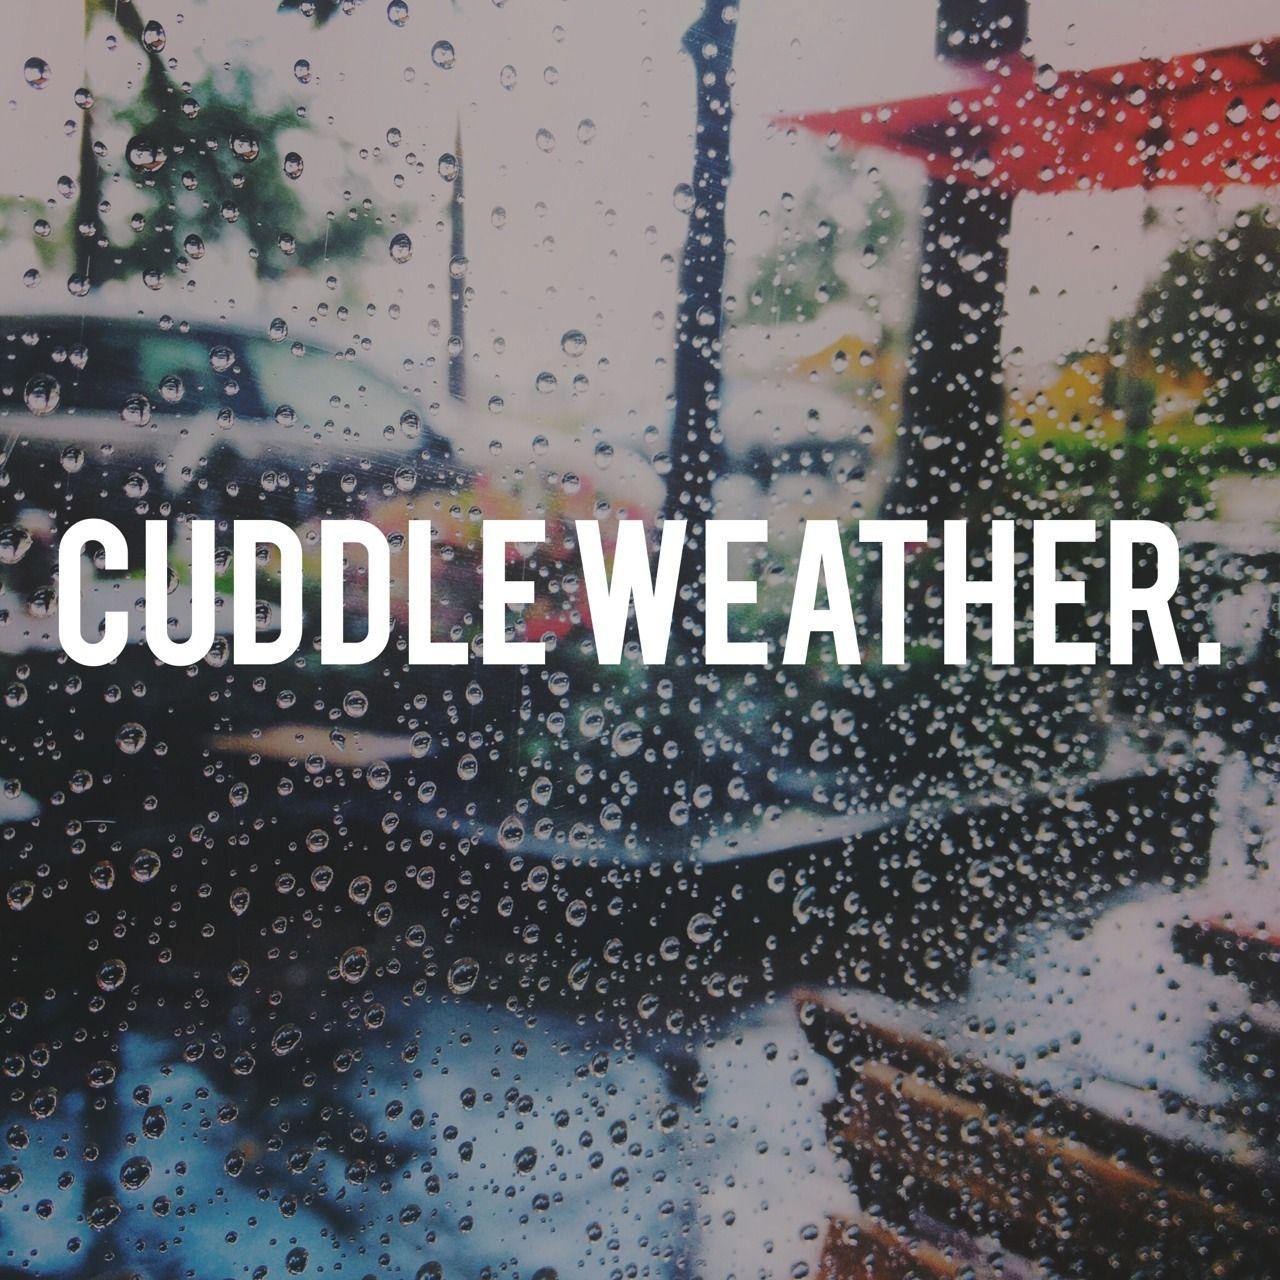 Cold Rainy Day Quotes: I N S P I R A T I O N ⚖️